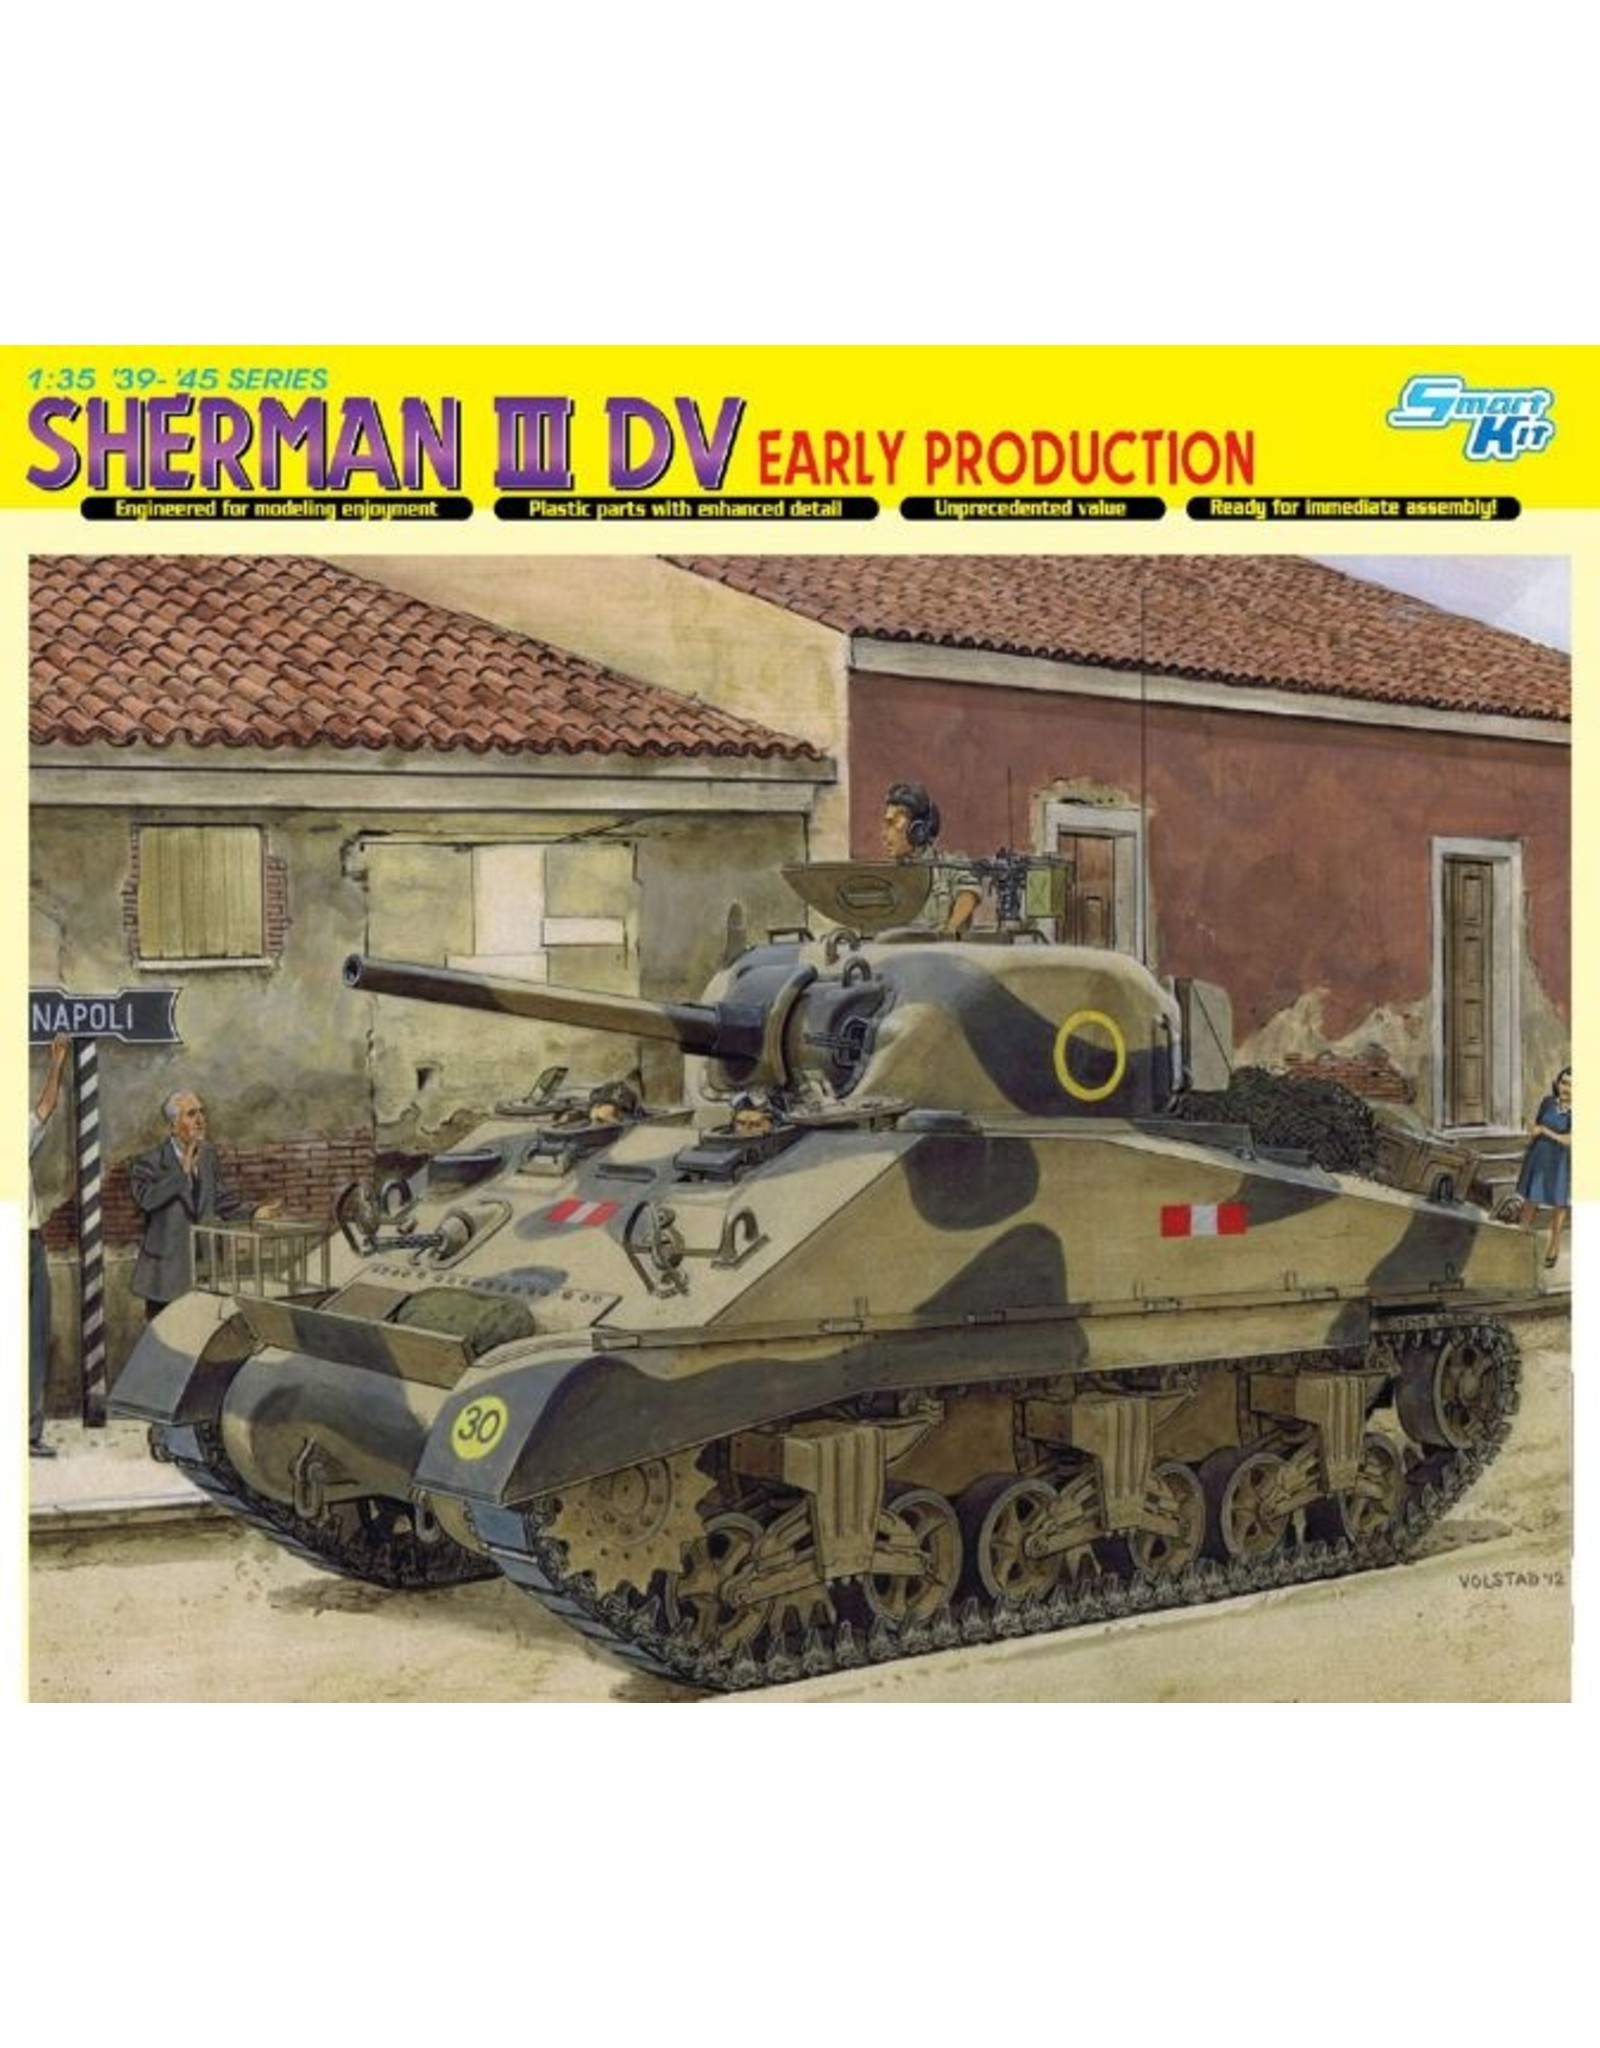 Dragon Models 6573 - 1/35 Sherman III DV, Early Production